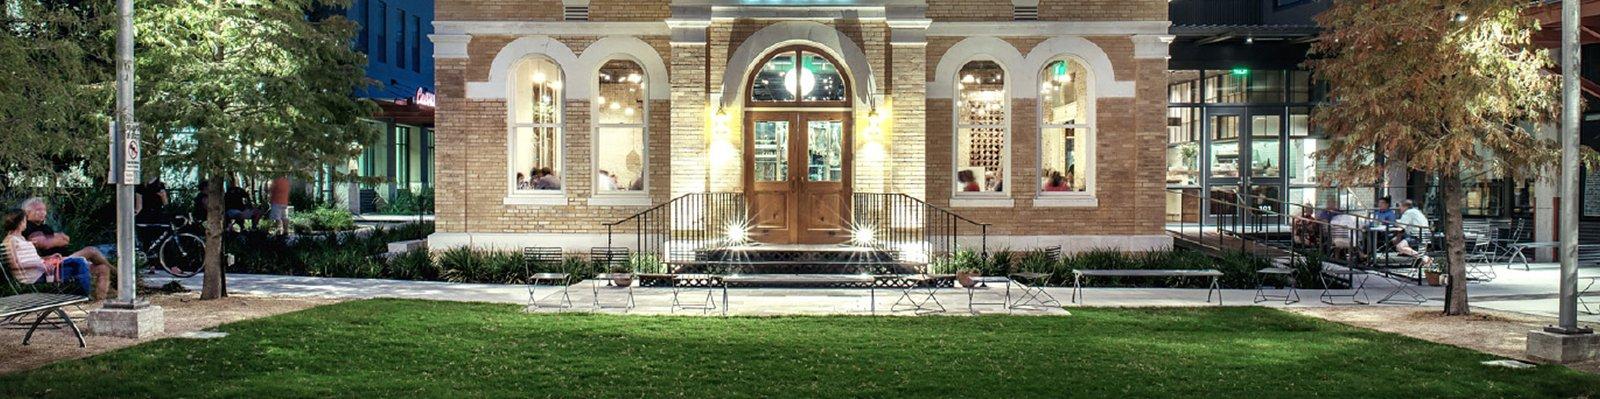 Apartments in San Antonio TX  Can Plant